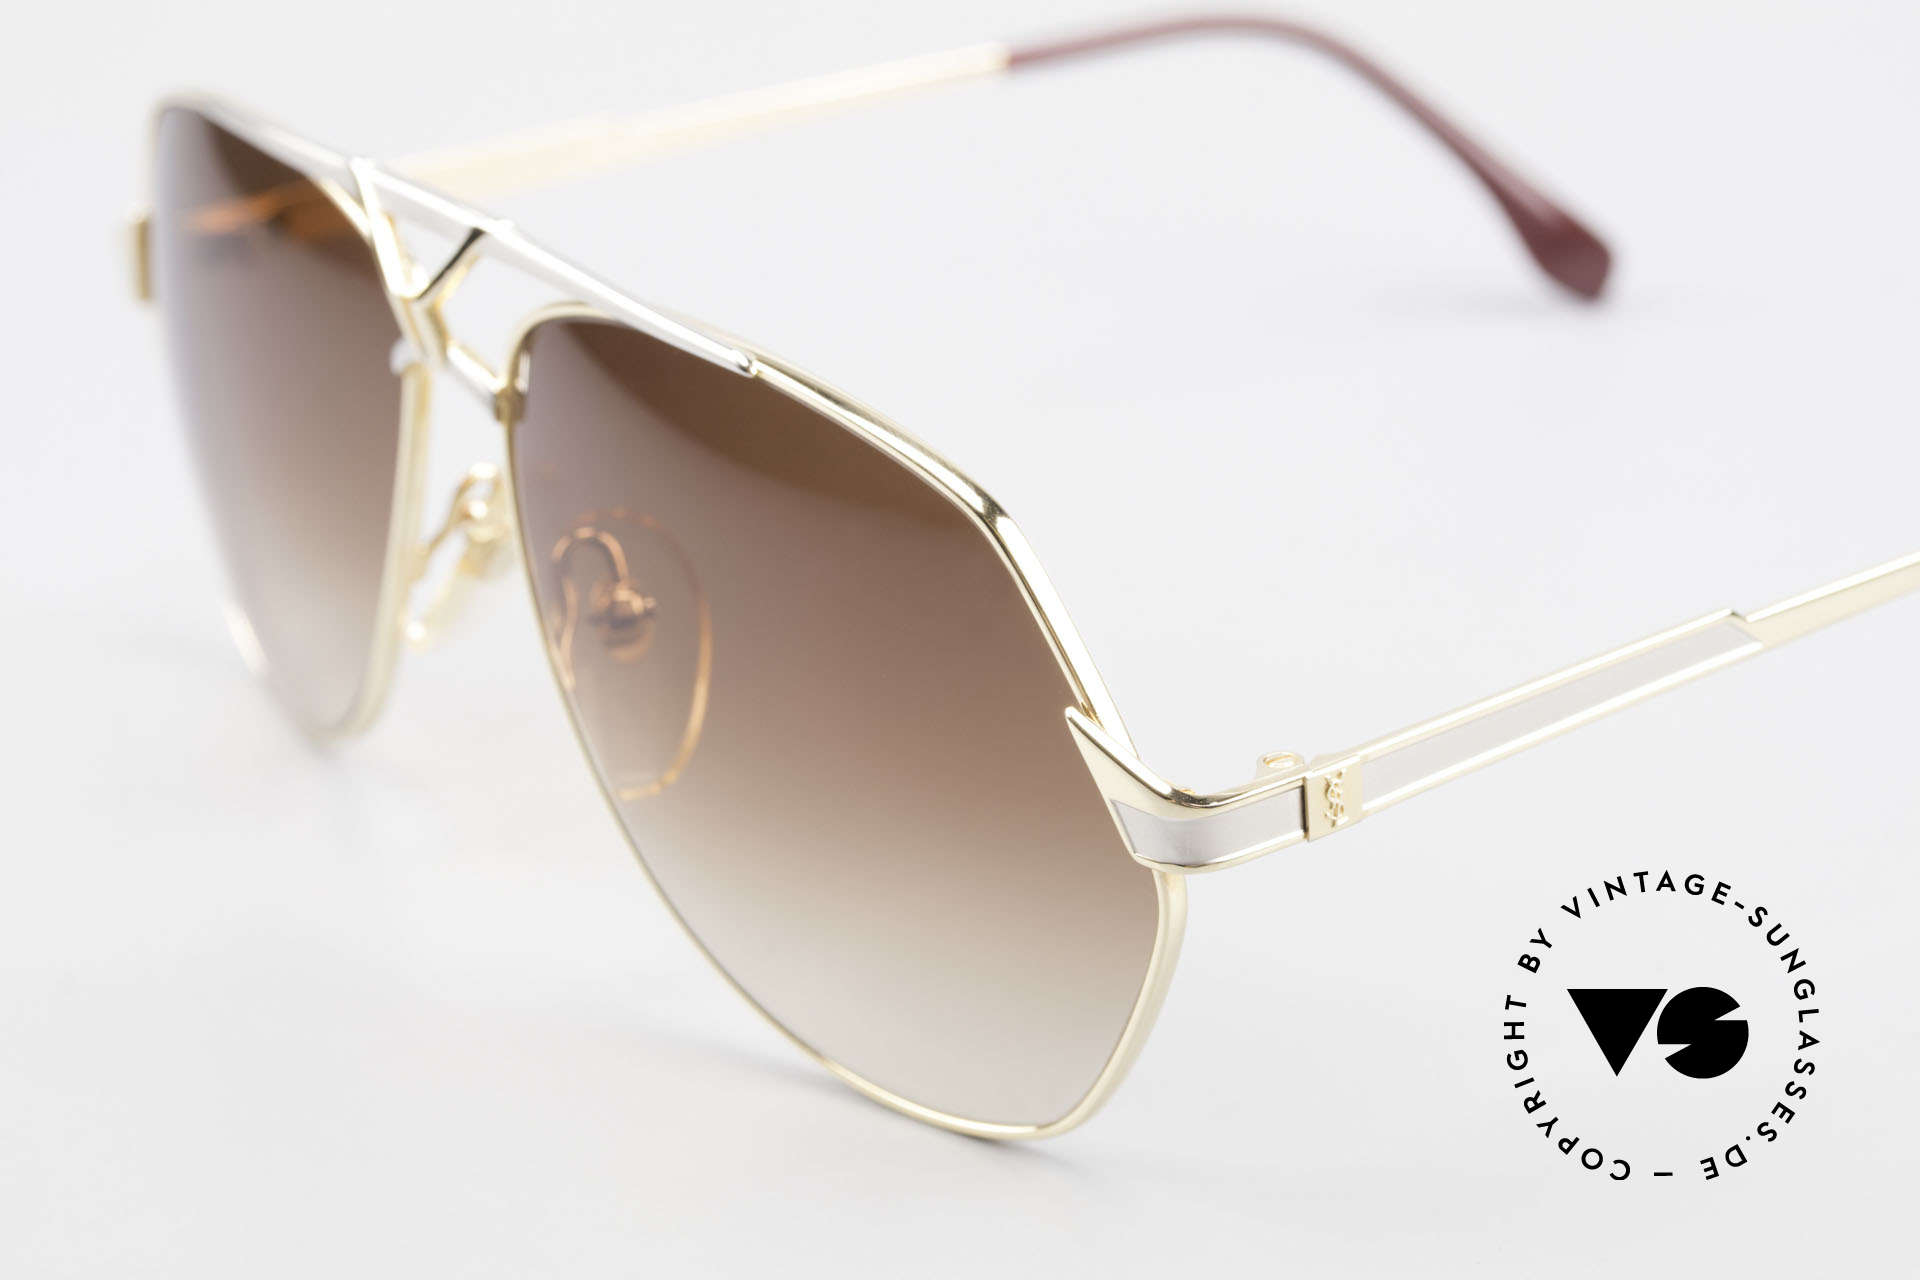 Yves Saint Laurent 8806 80's YSL Men's Luxury Shades, never worn (like all our vintage YSL sunglasses), Made for Men